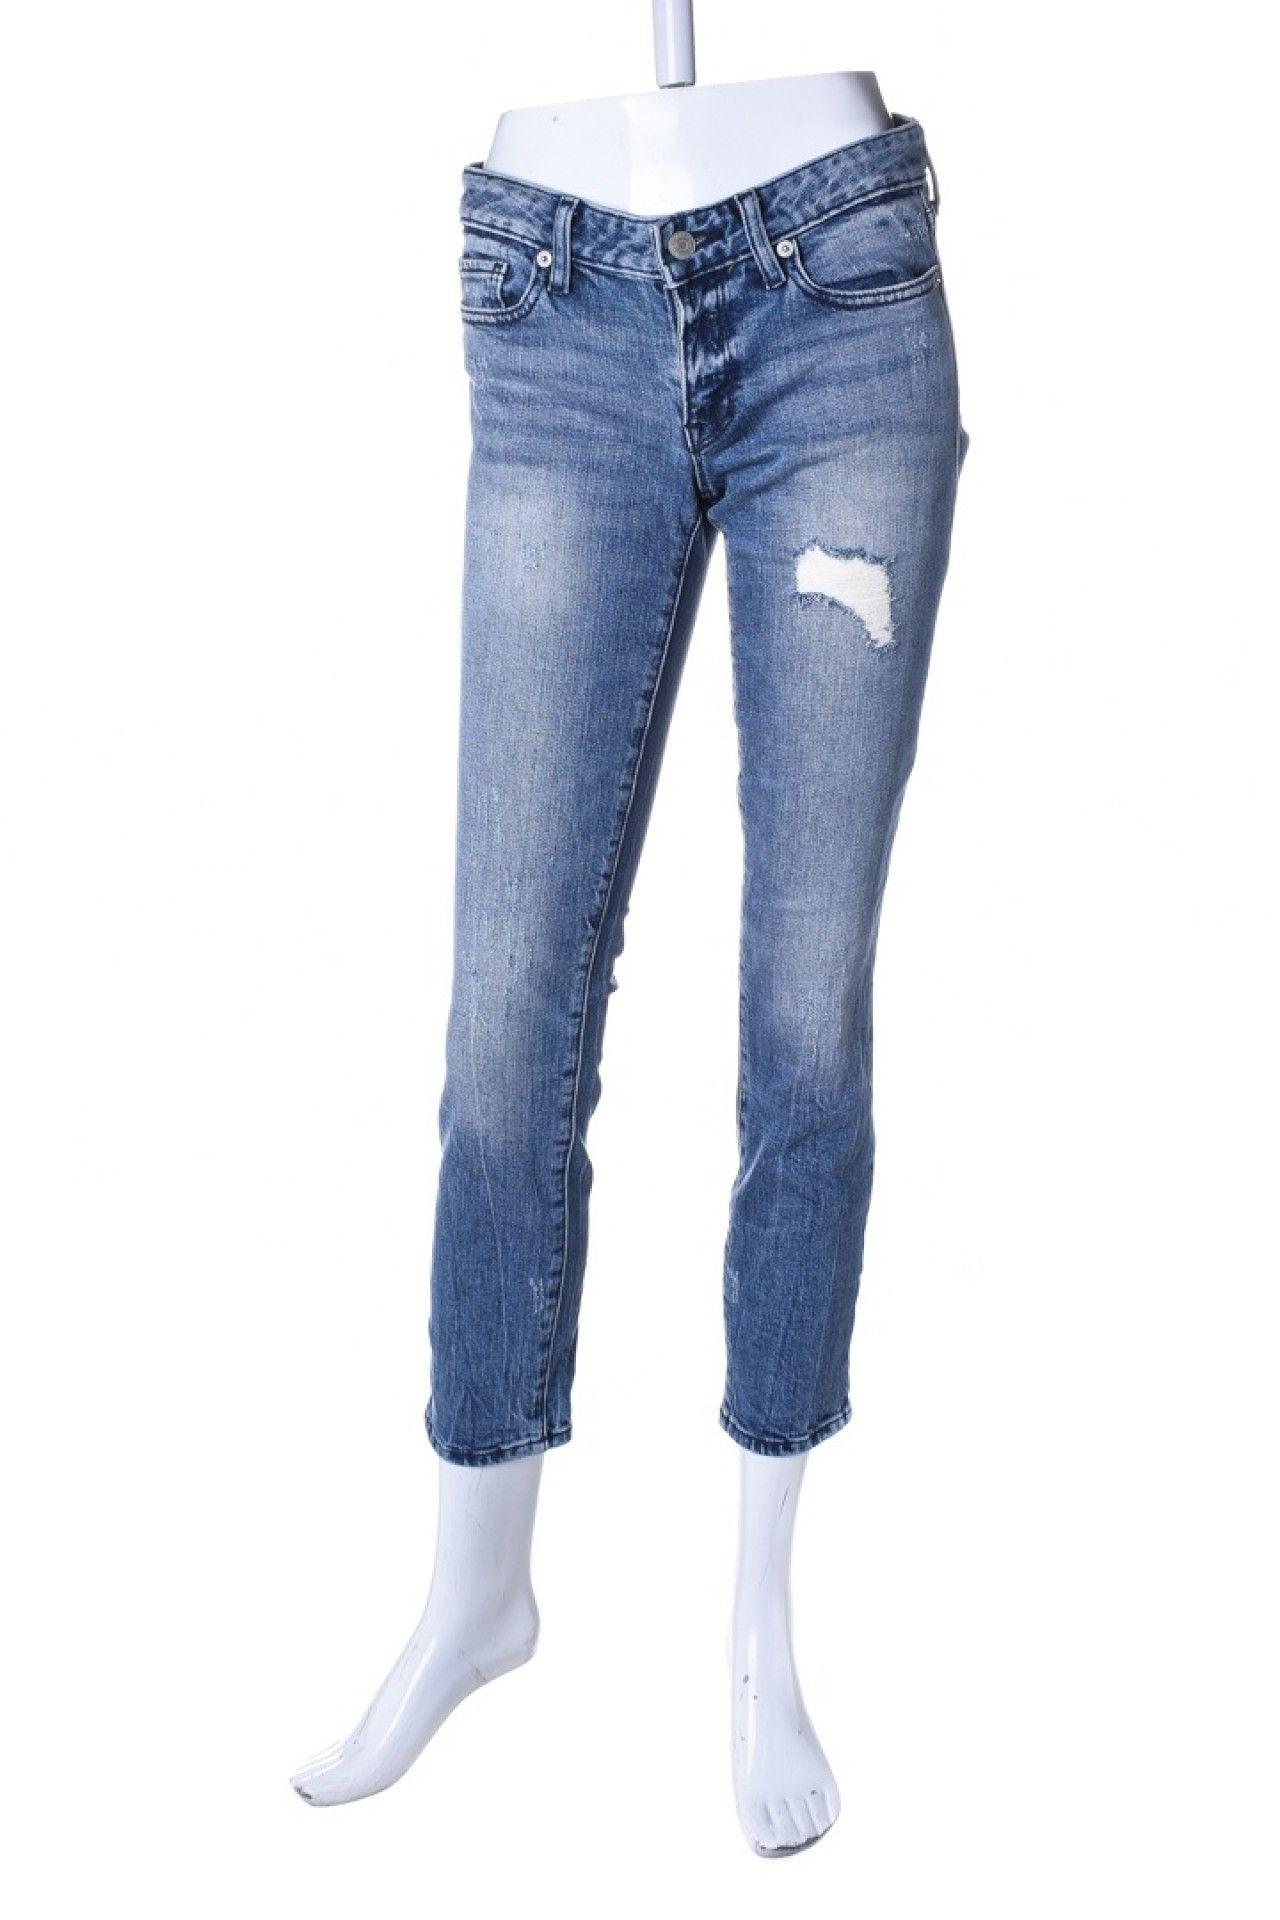 Gap - Calça Jeans Destroyed  - Foto 1